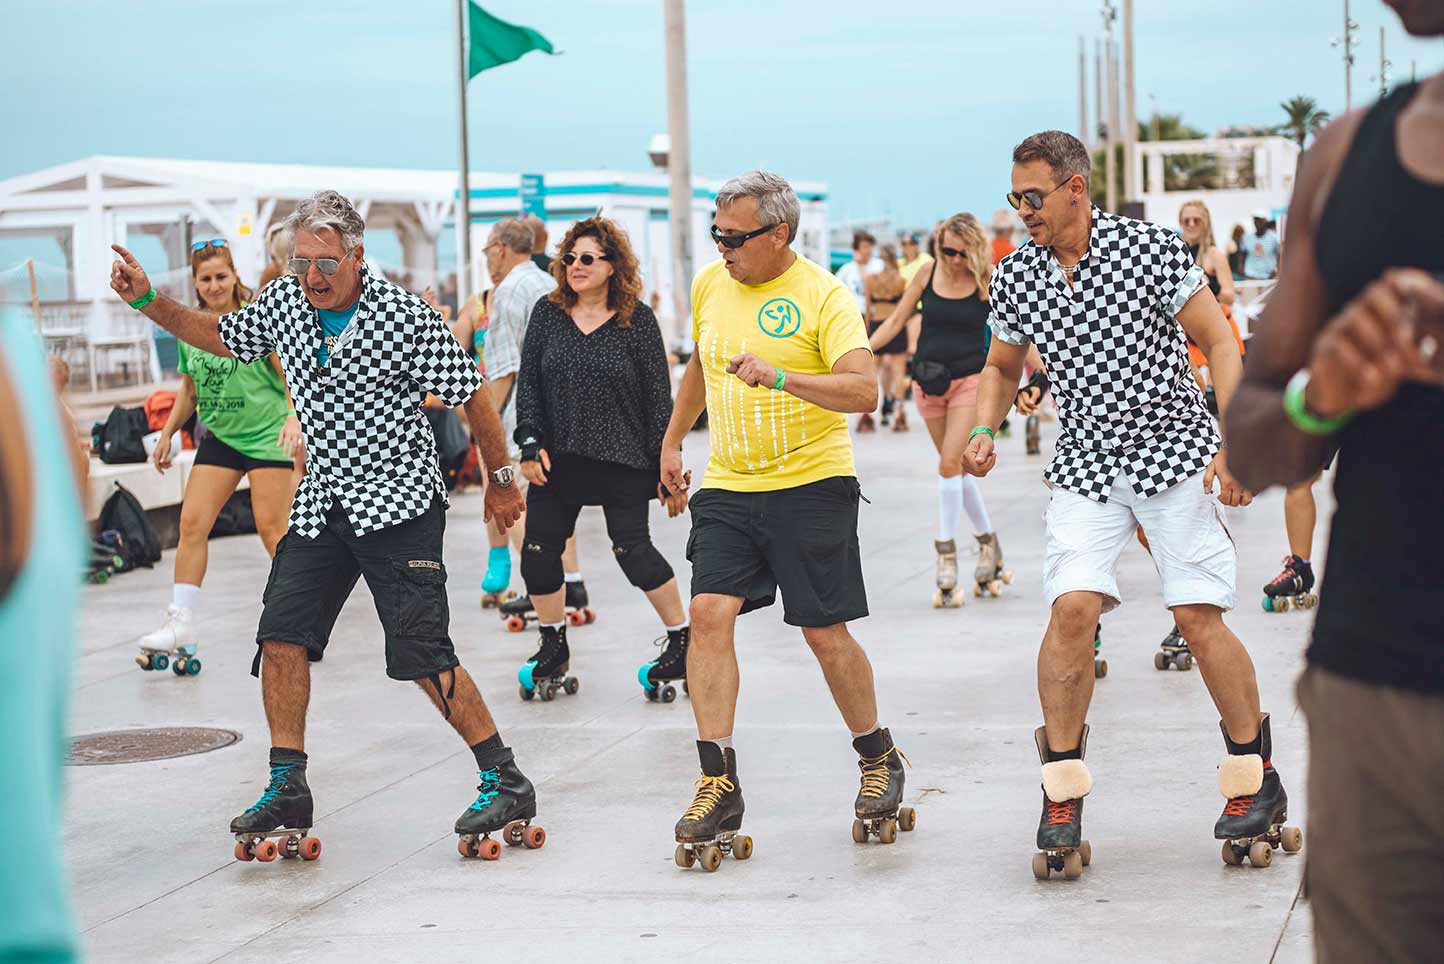 skating festival barcelona